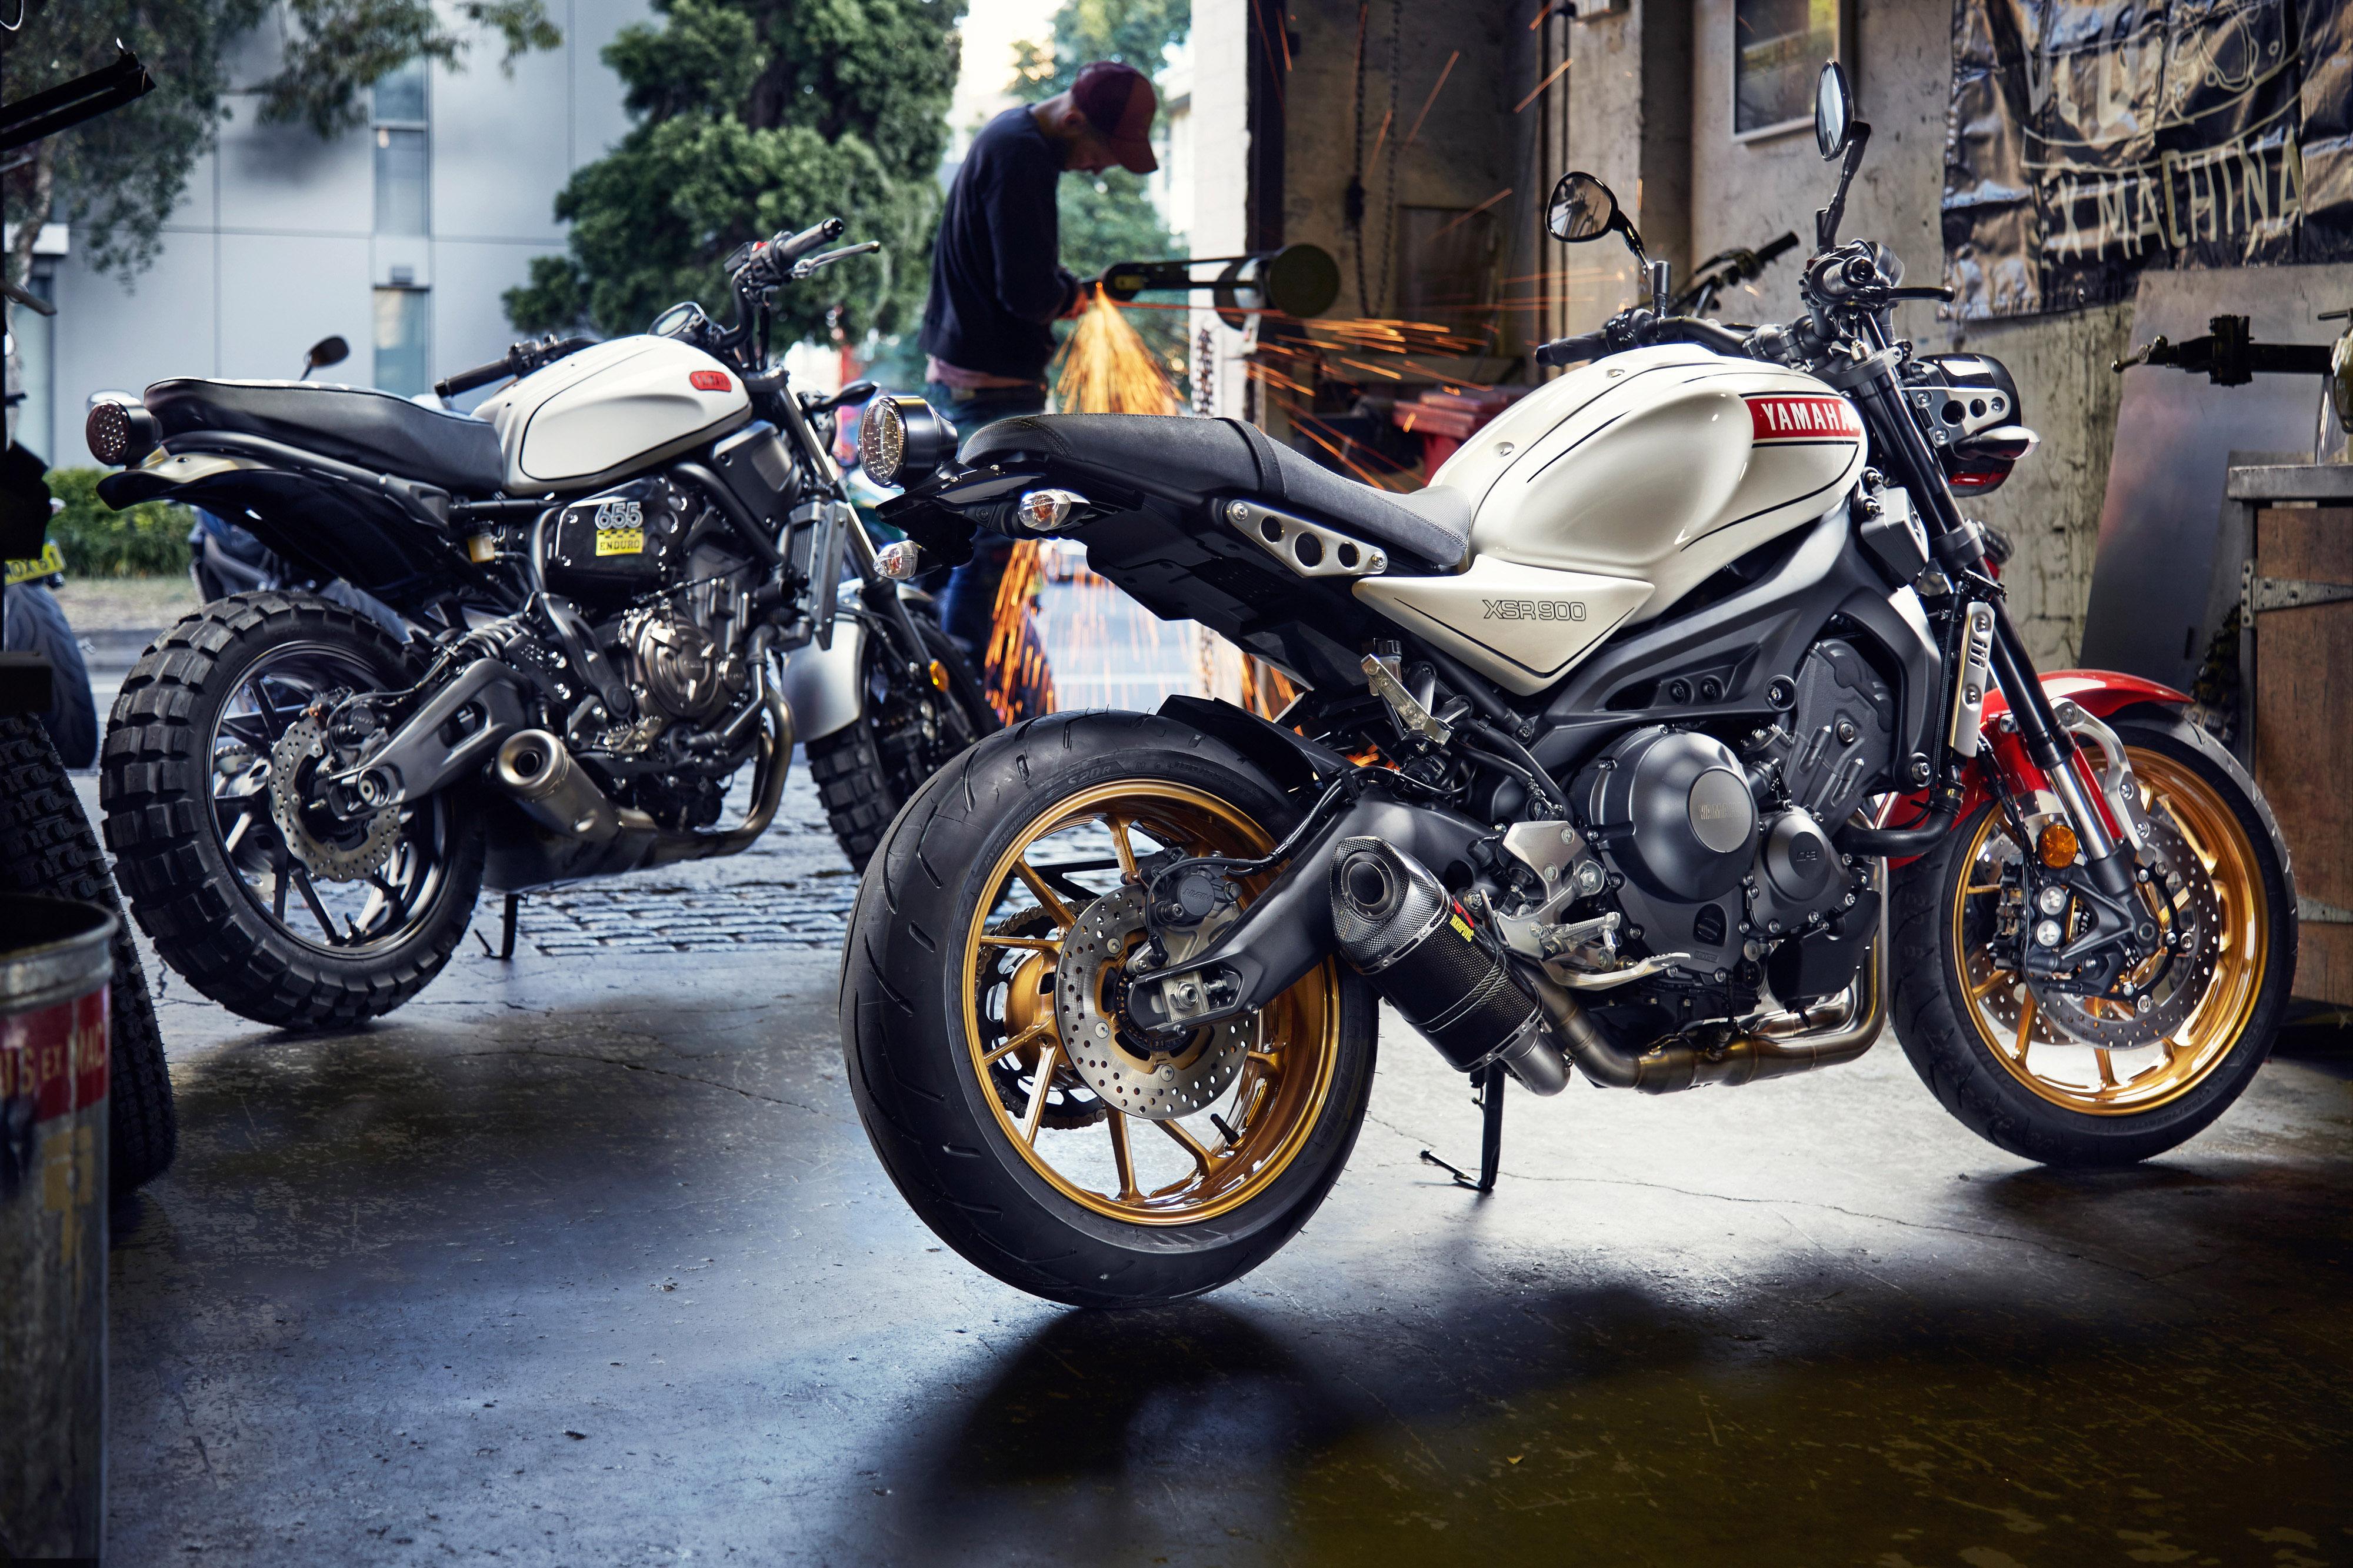 Yamaha xsrs take throttle roll bike review for Yamaha xsr900 price